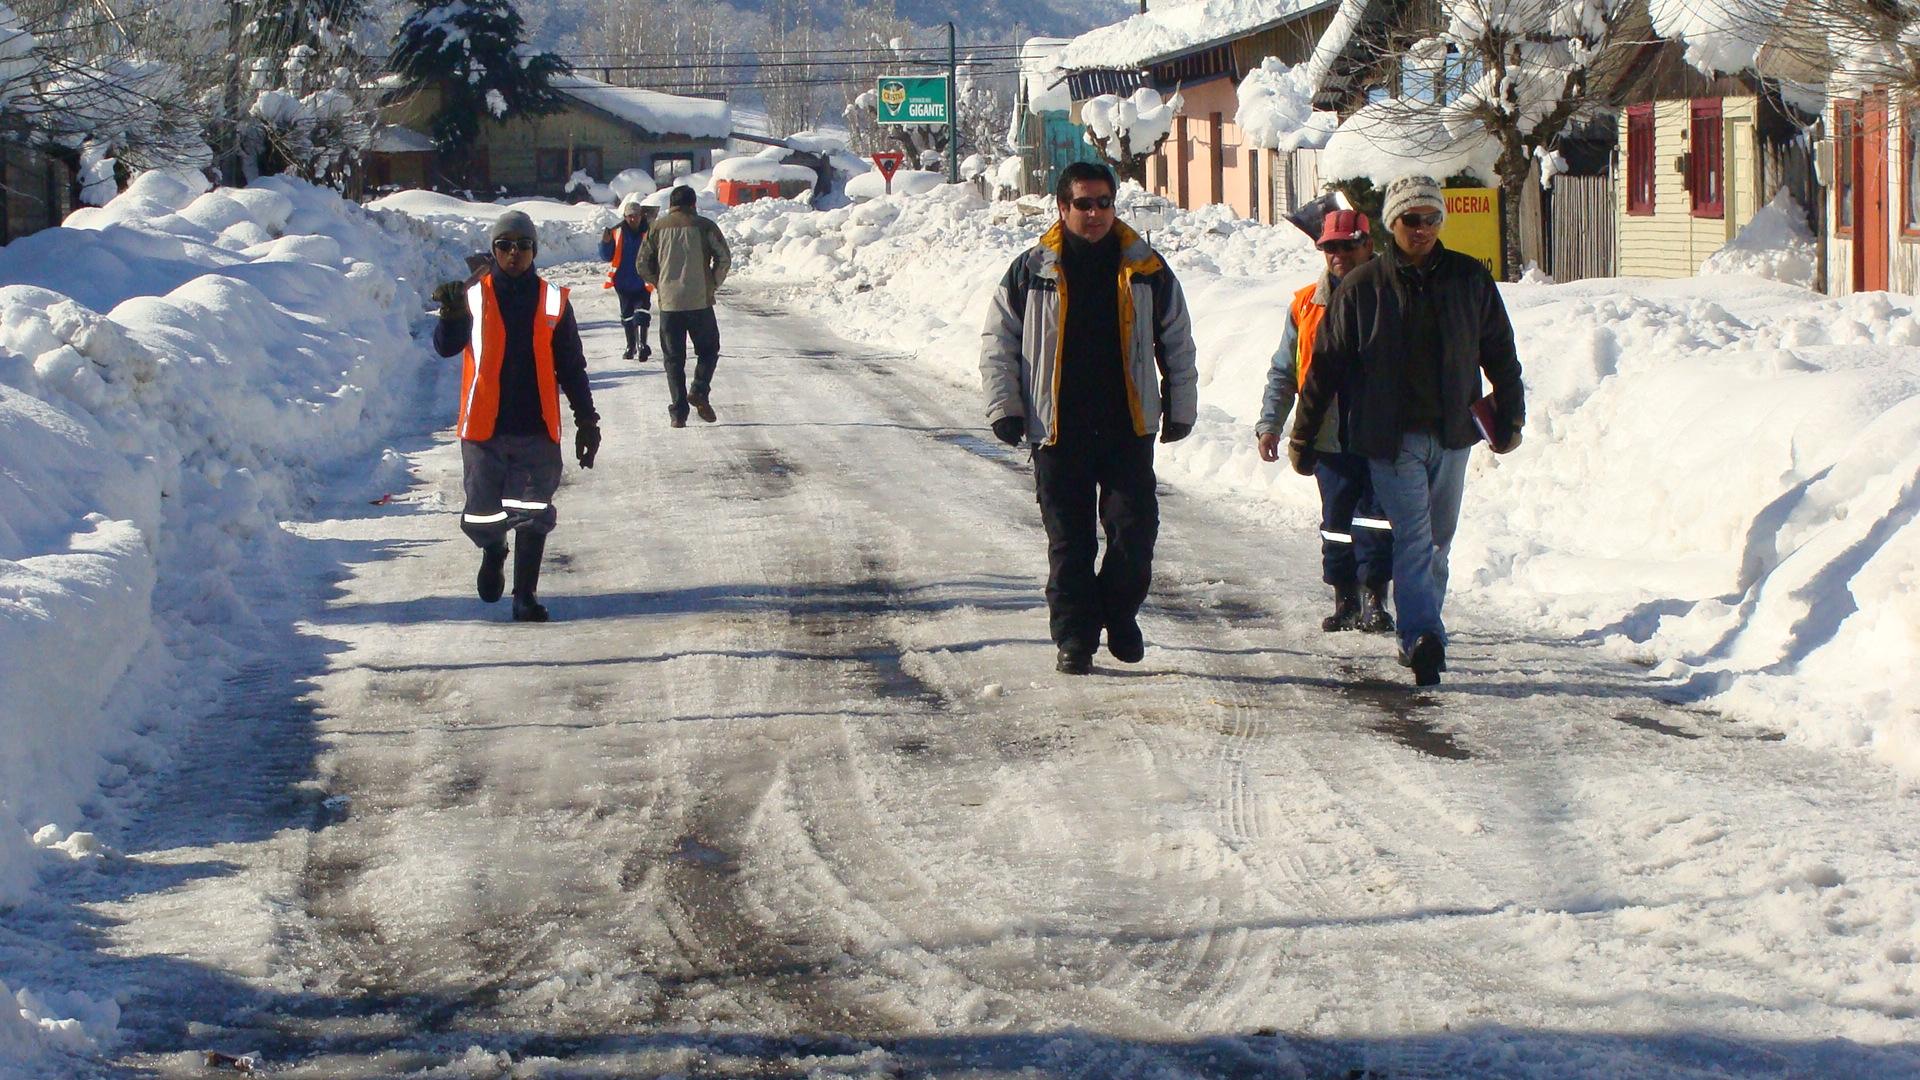 Terremoto blanco lonquimay bajo la nieve la opi for Blanco nieve